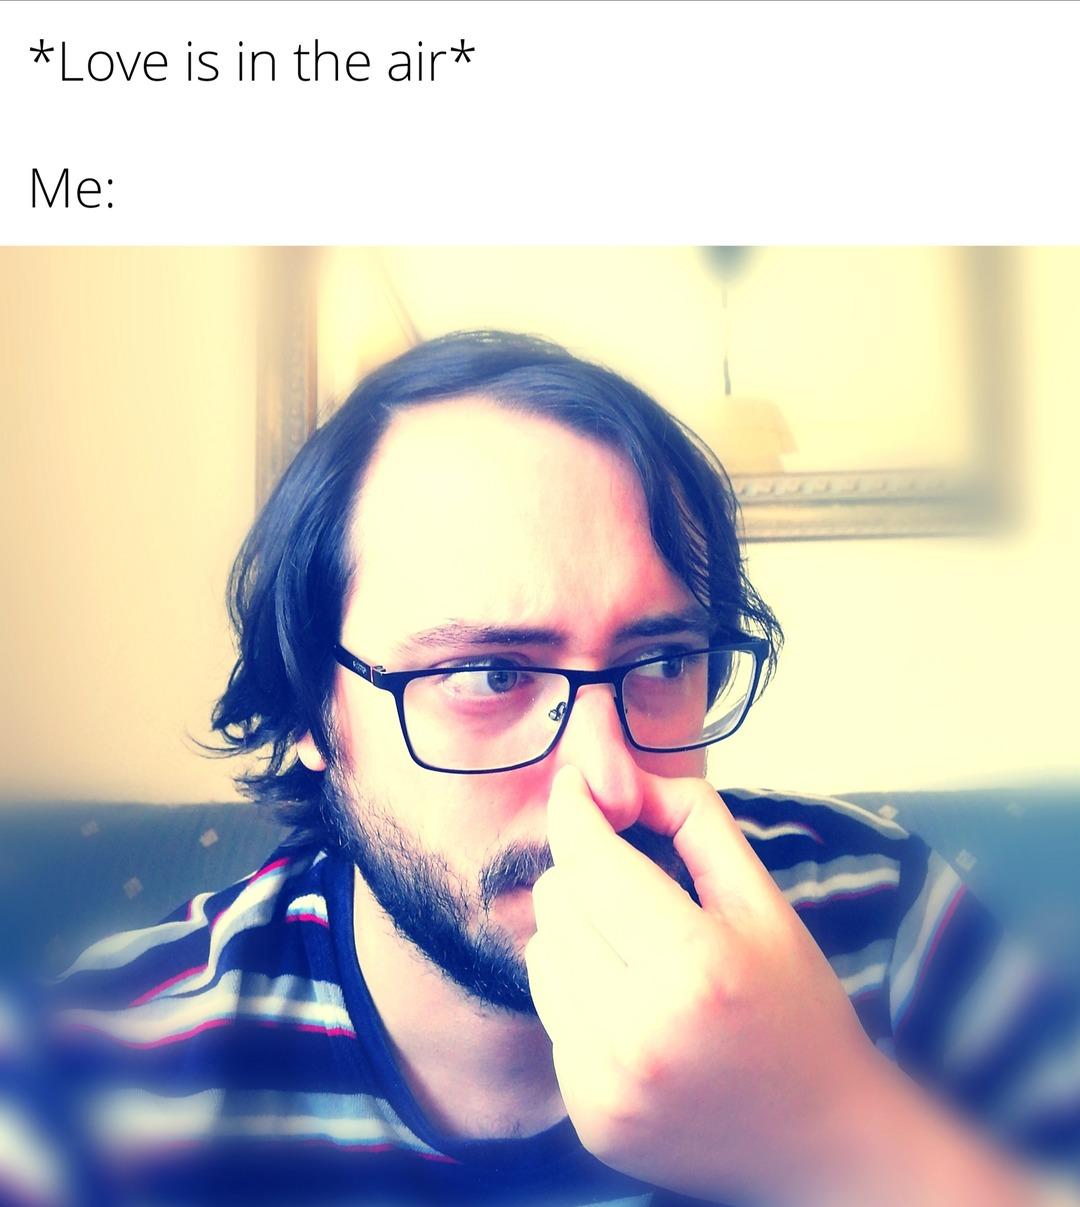 Love is in the air - meme